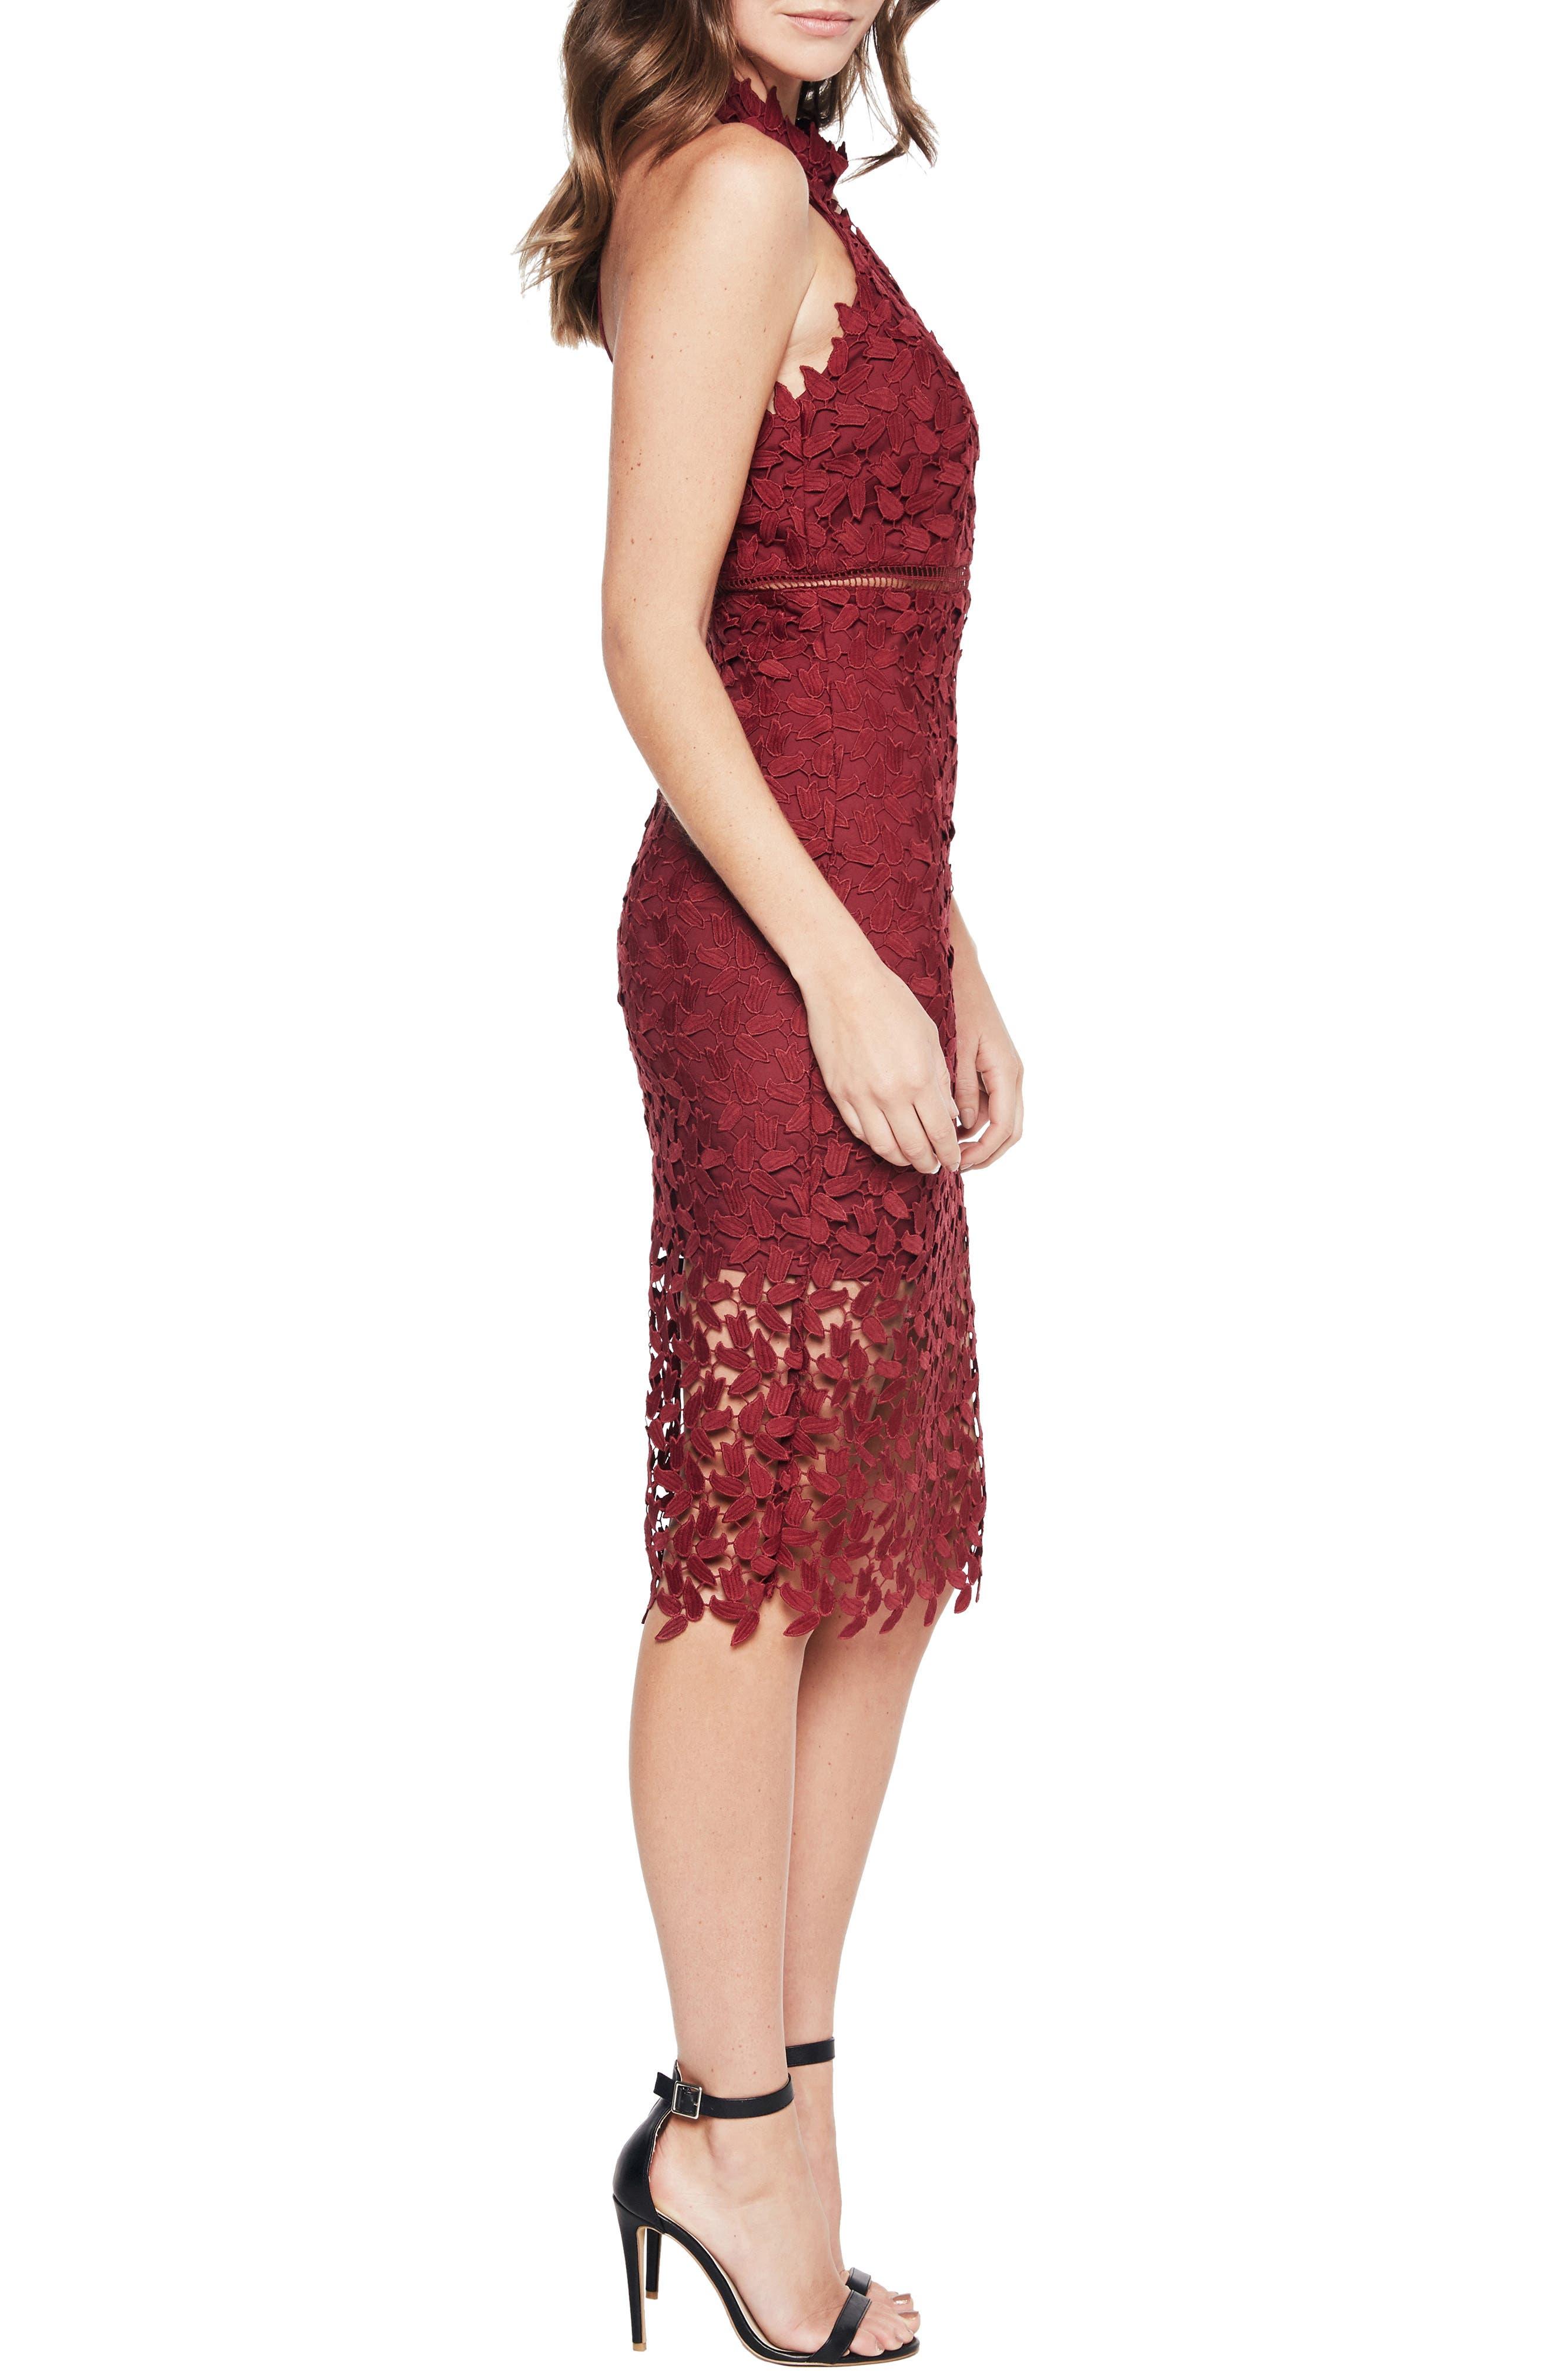 BARDOT, Gemma Halter Lace Sheath Dress, Alternate thumbnail 4, color, BURGUNDY